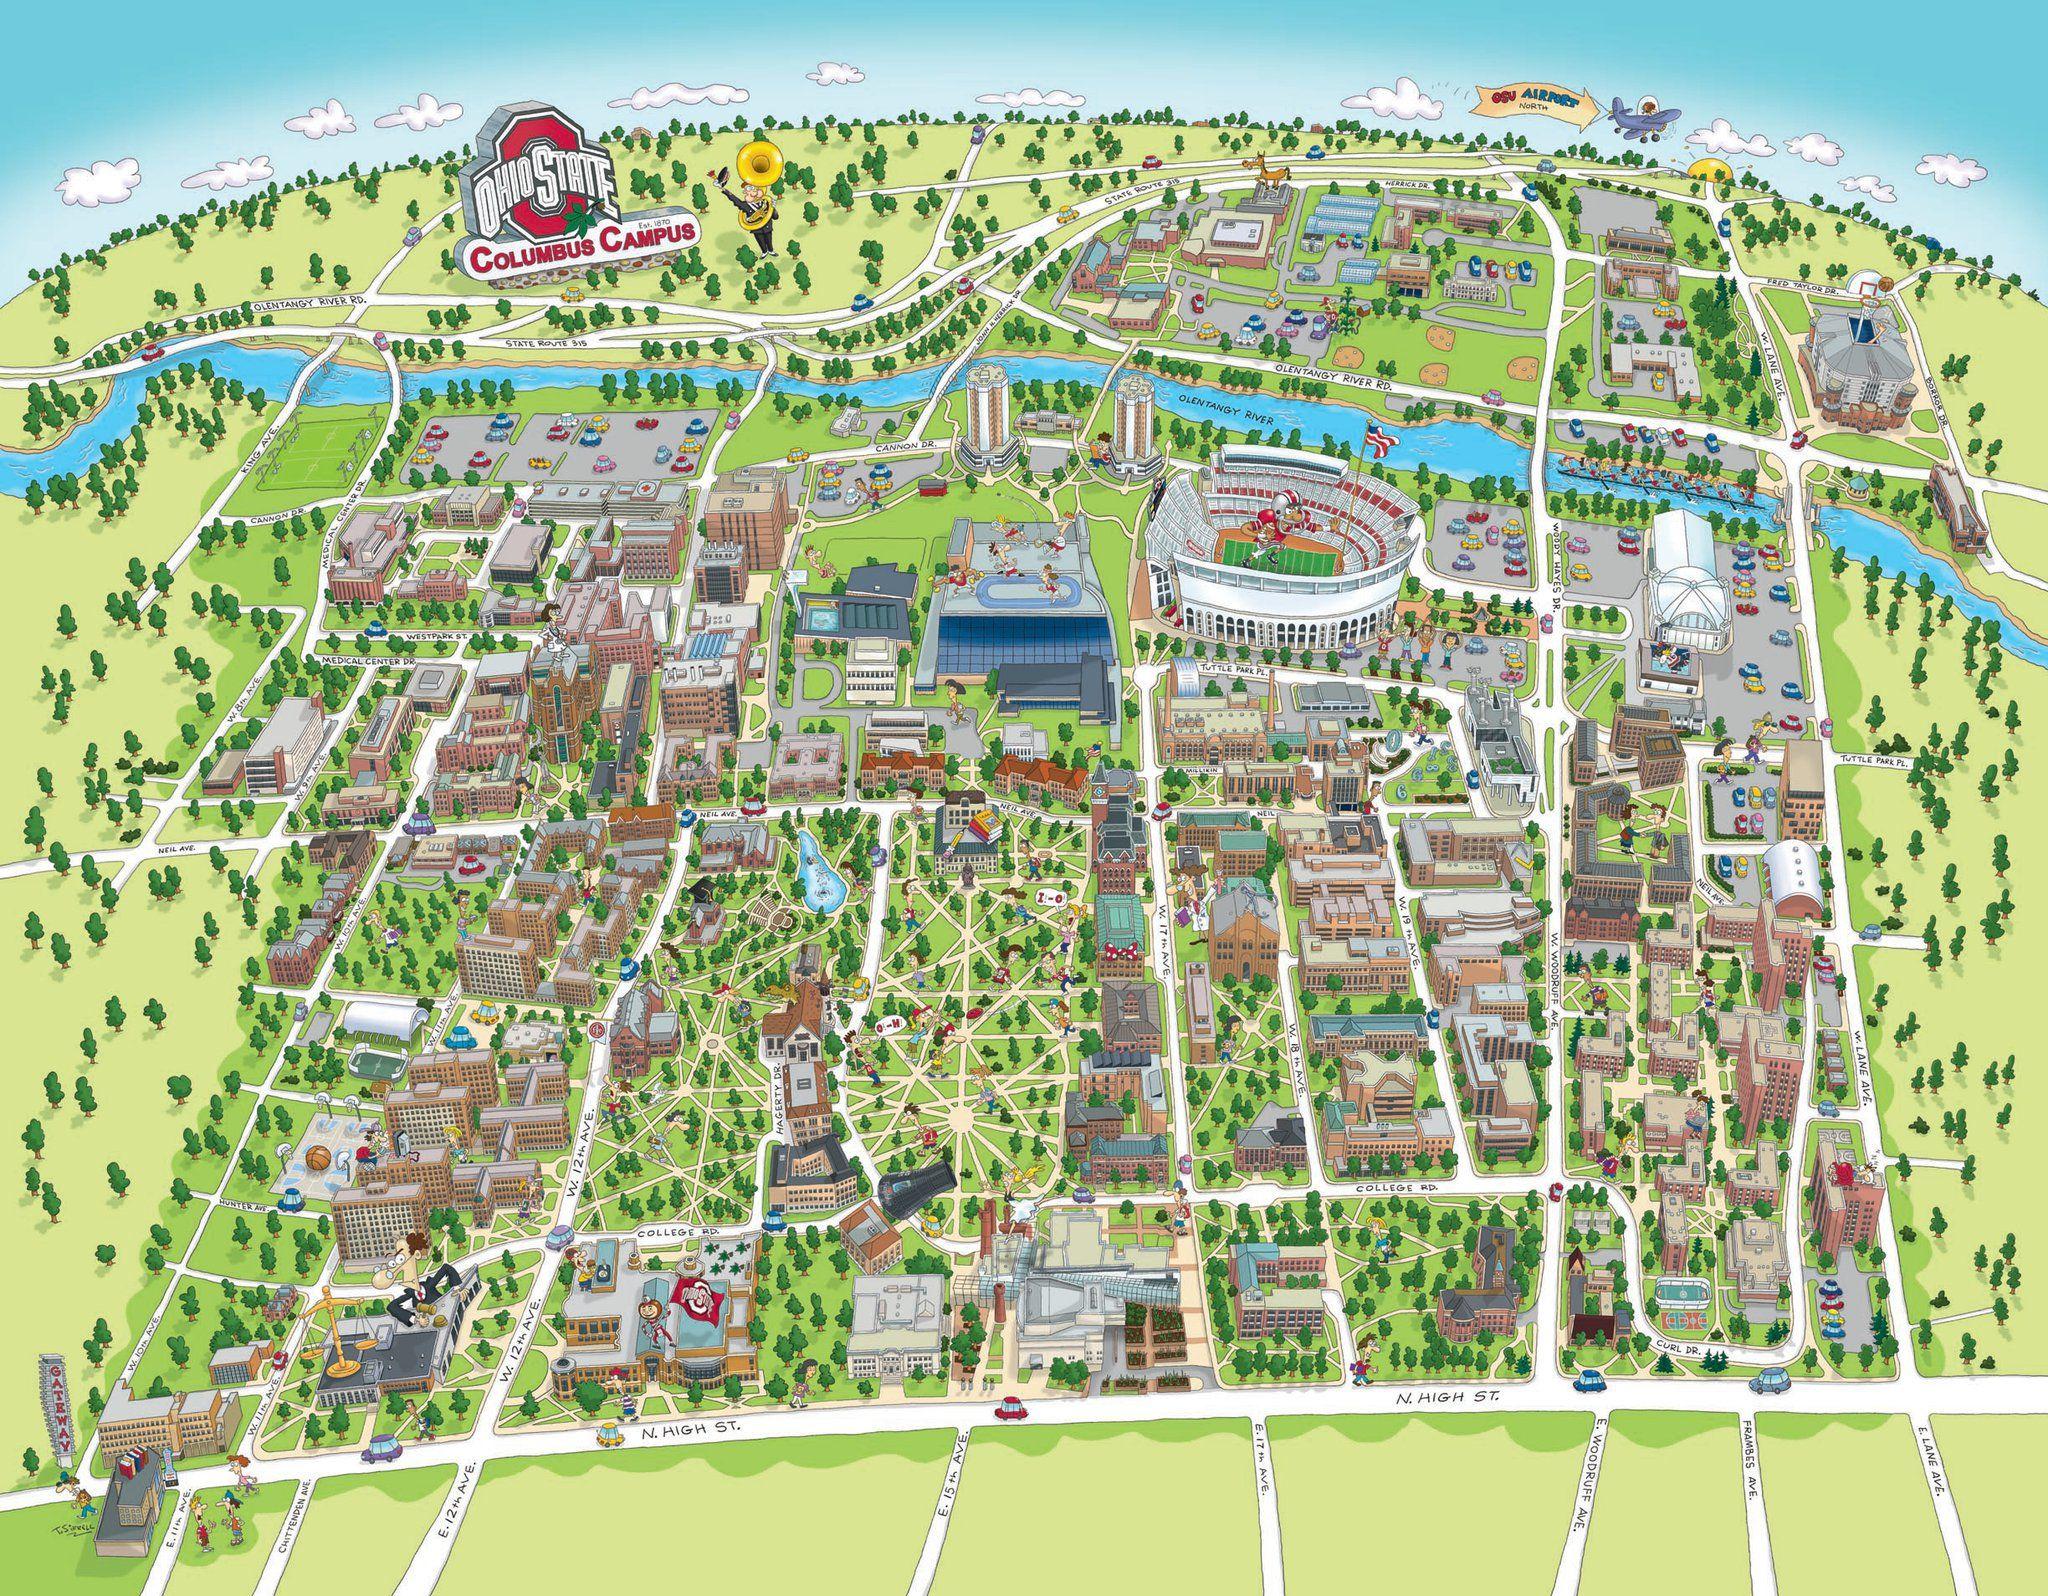 Heres A Cartoon Map I Created For Ohio State University Via - Us map ohio state